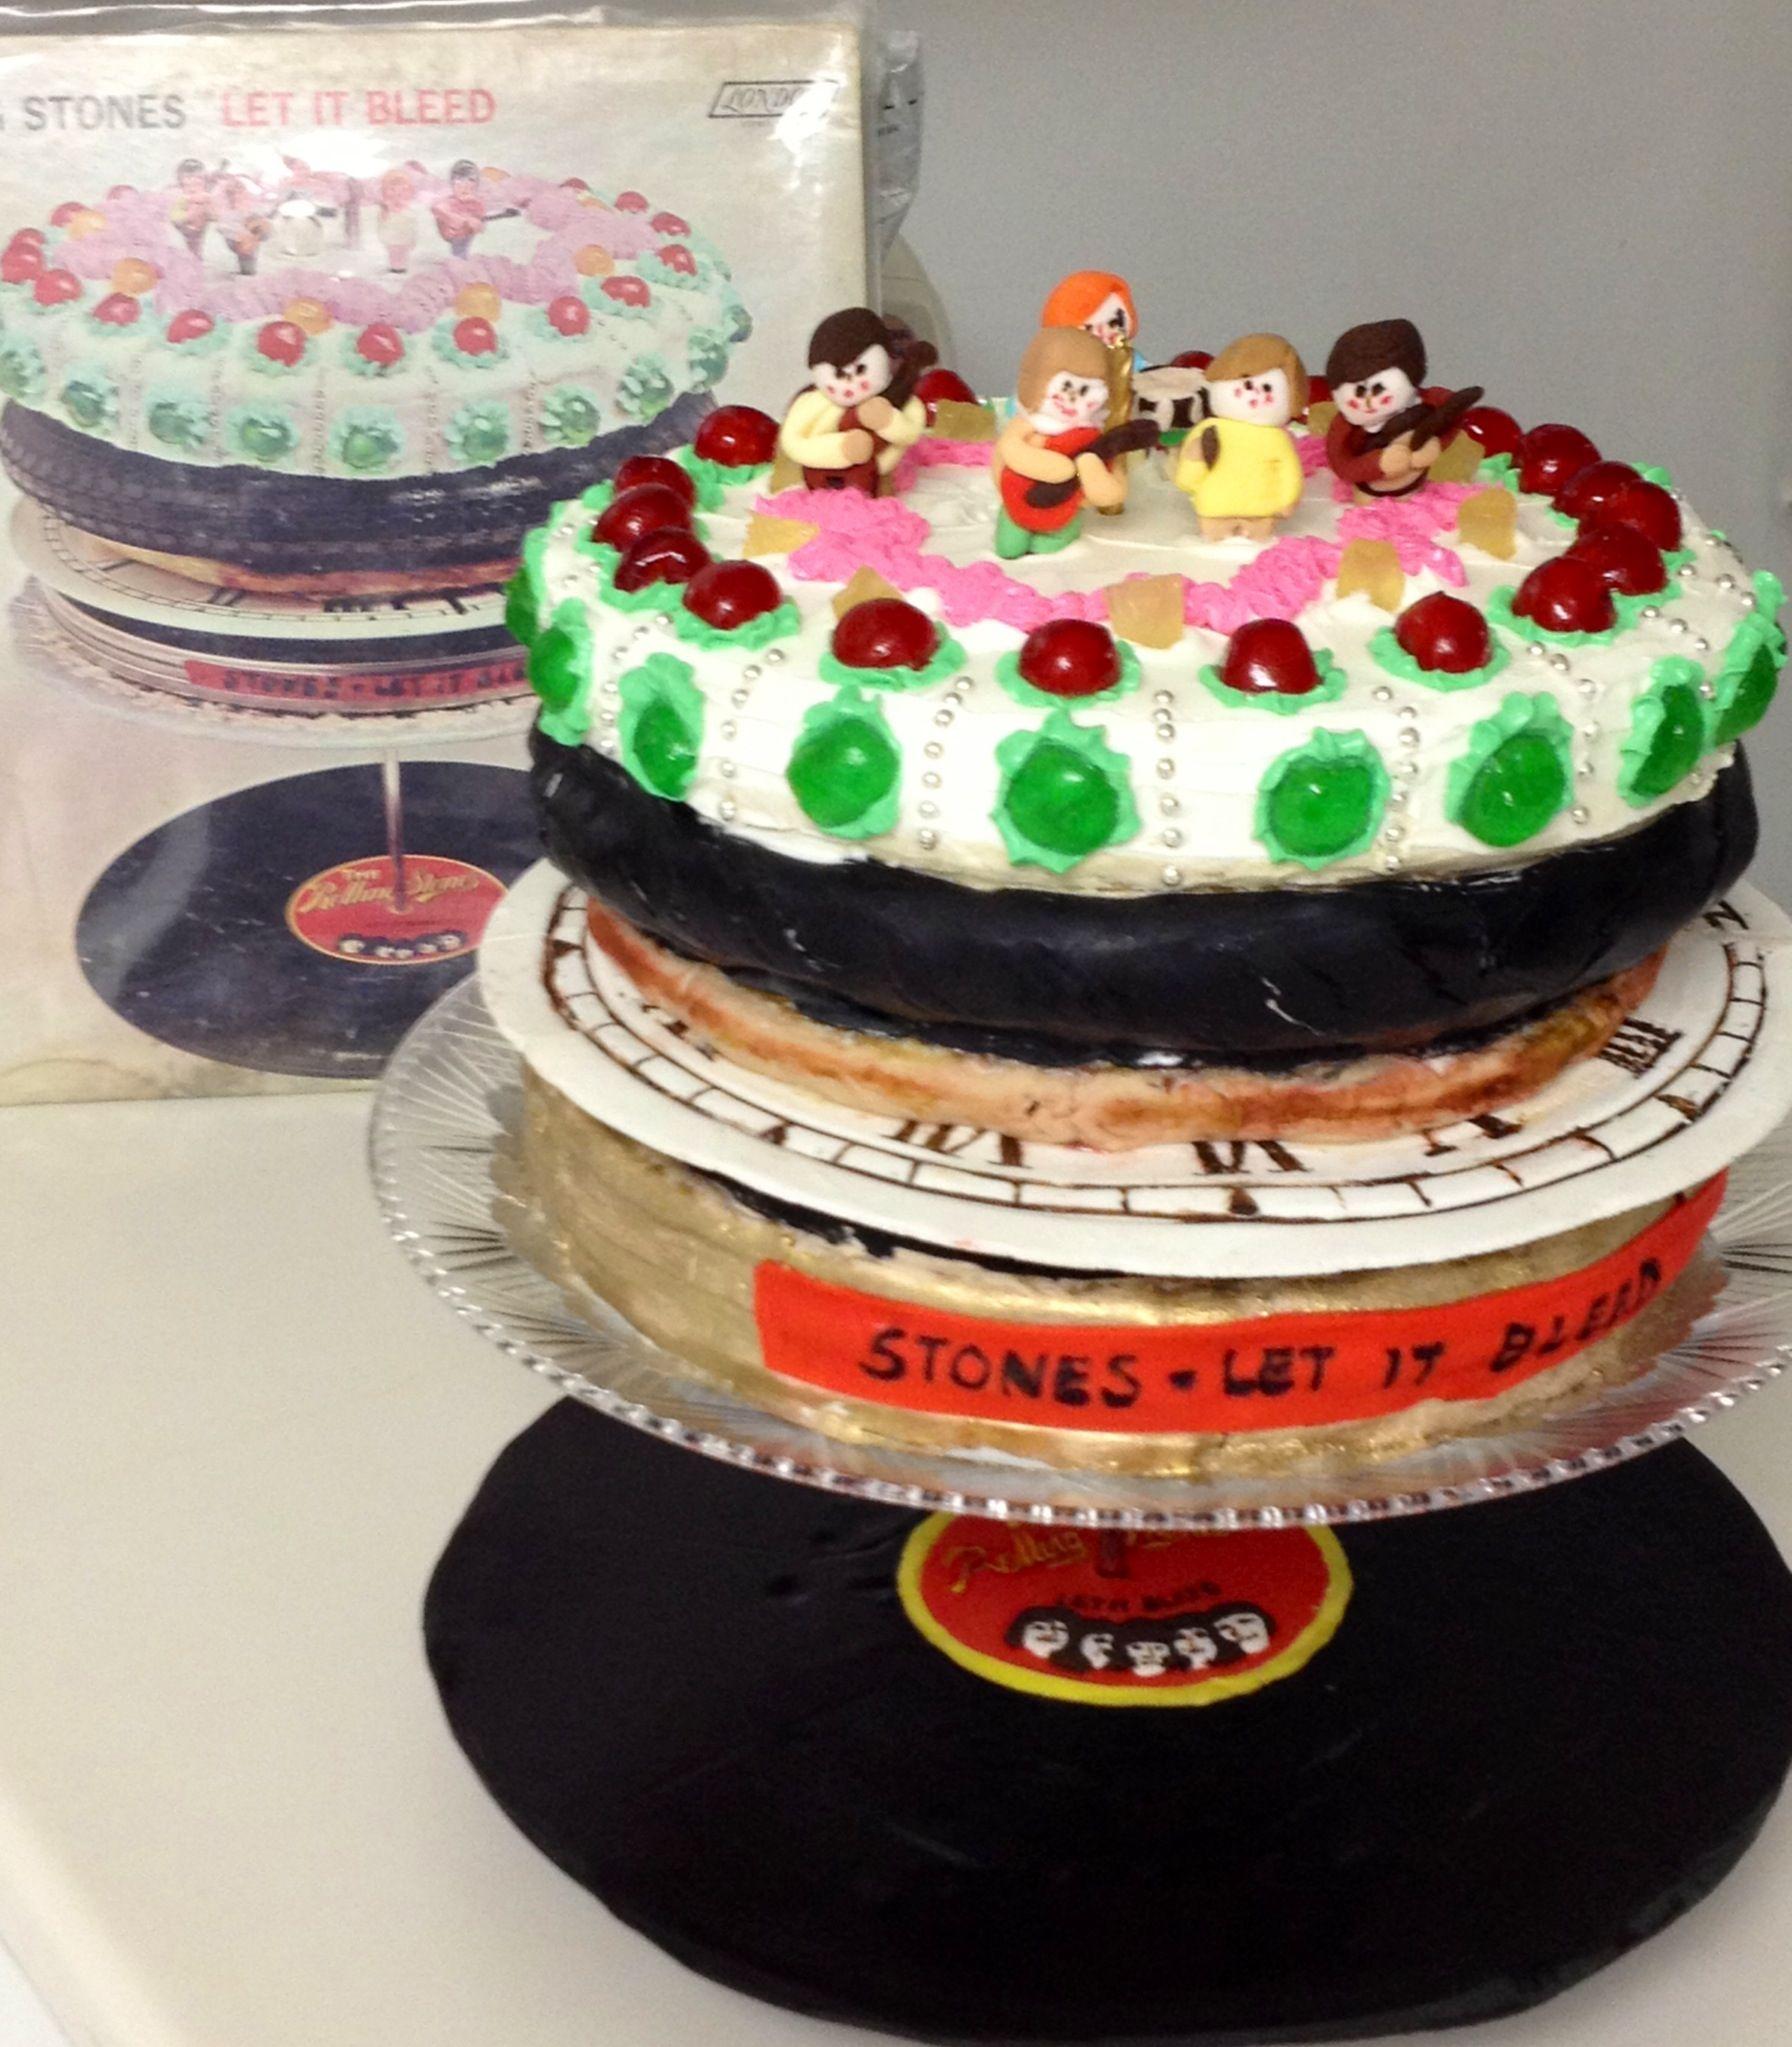 Rolling Stones Album Cover Cake. Let It Bleed.